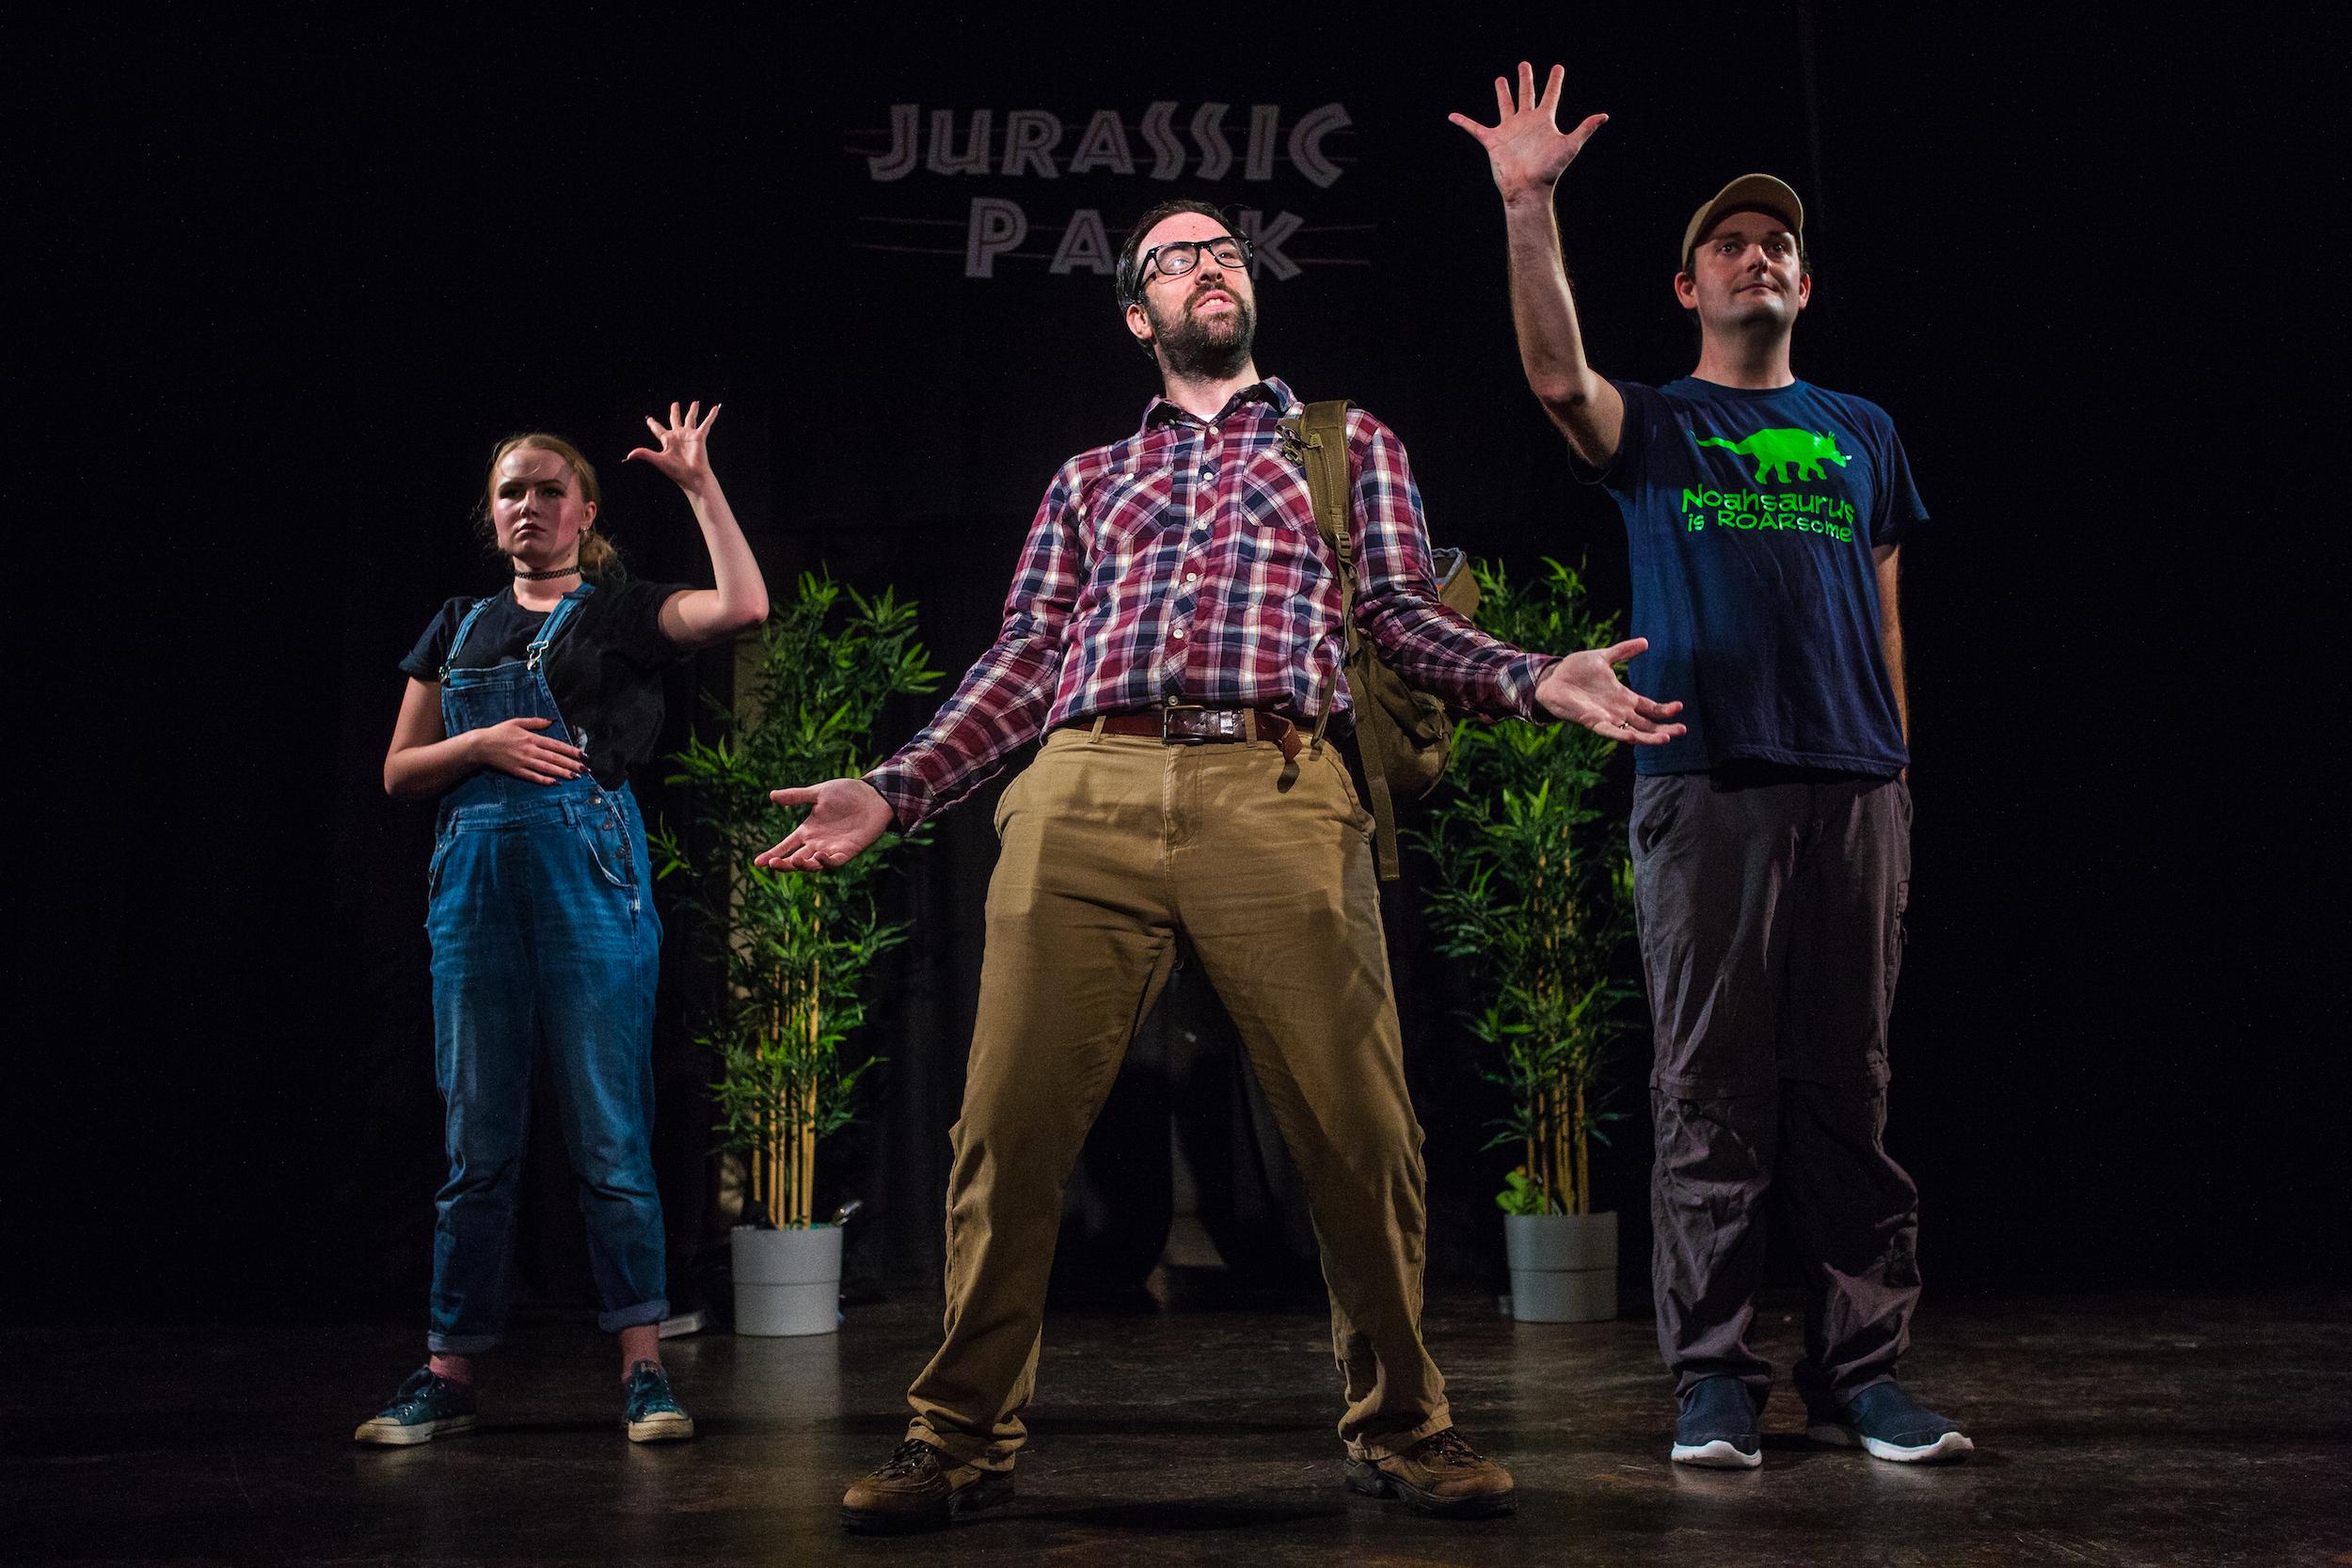 Jurassic Website 102.jpg